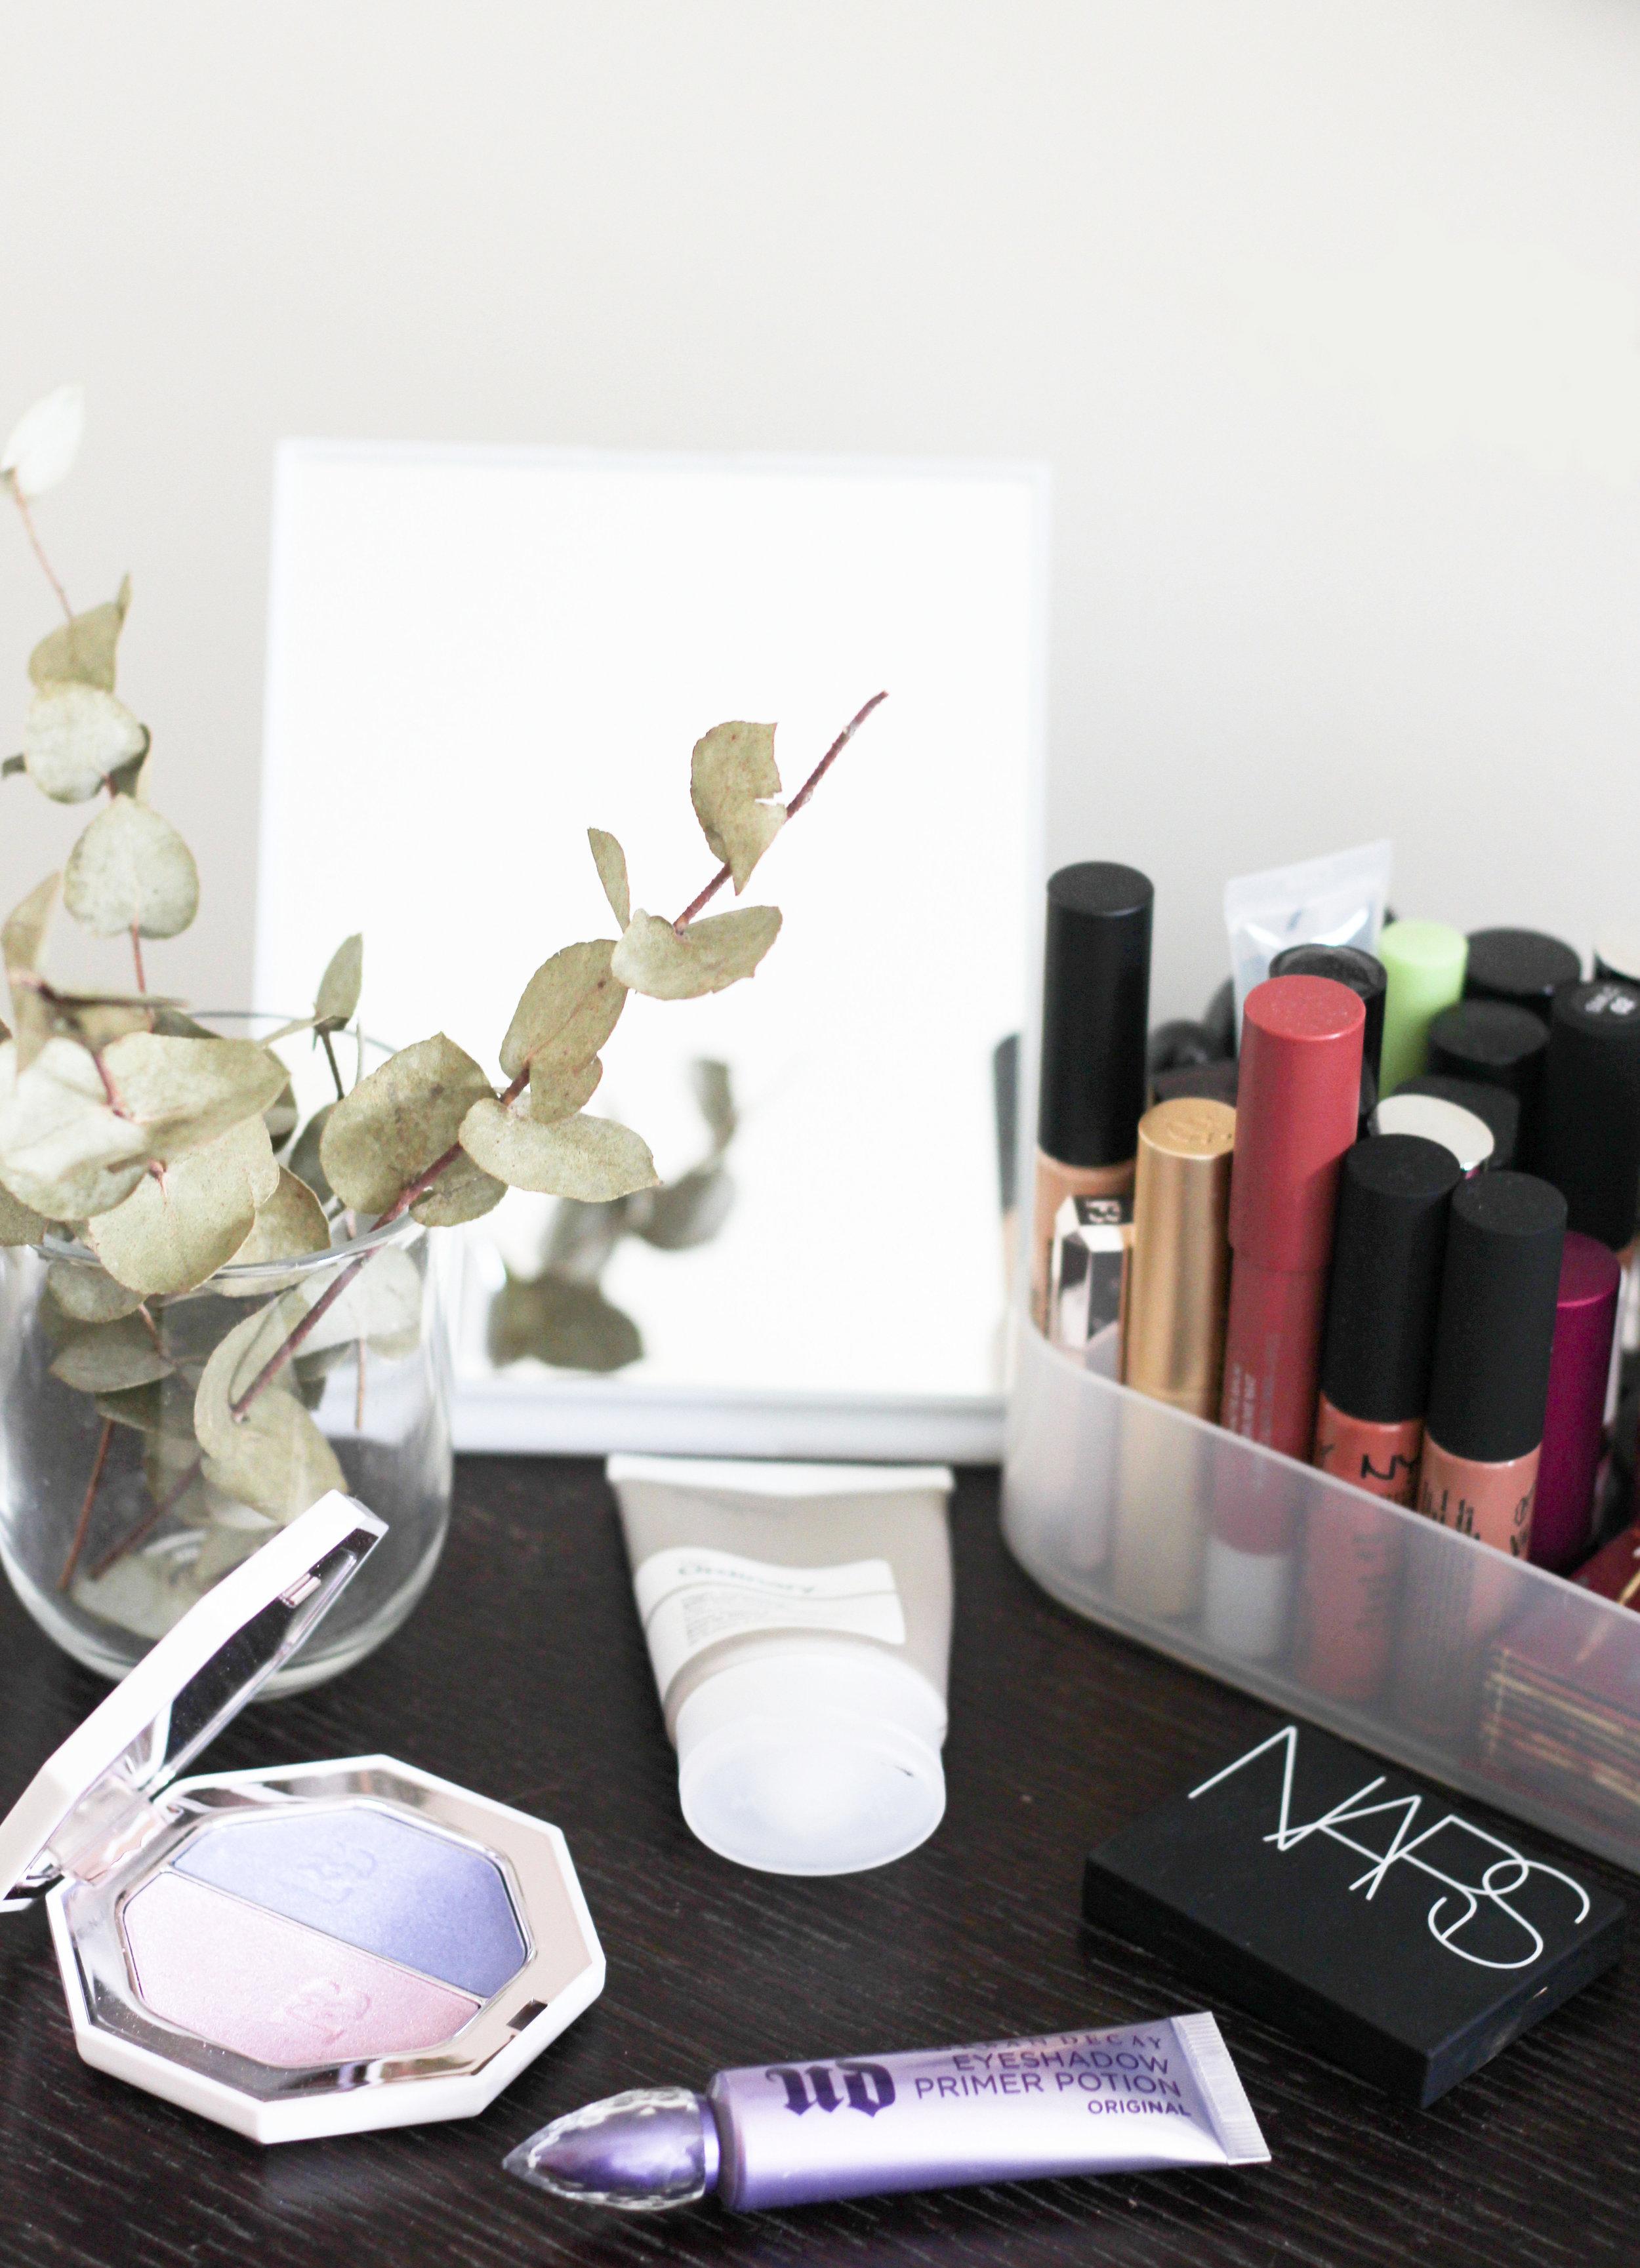 makeupcollection.jpg